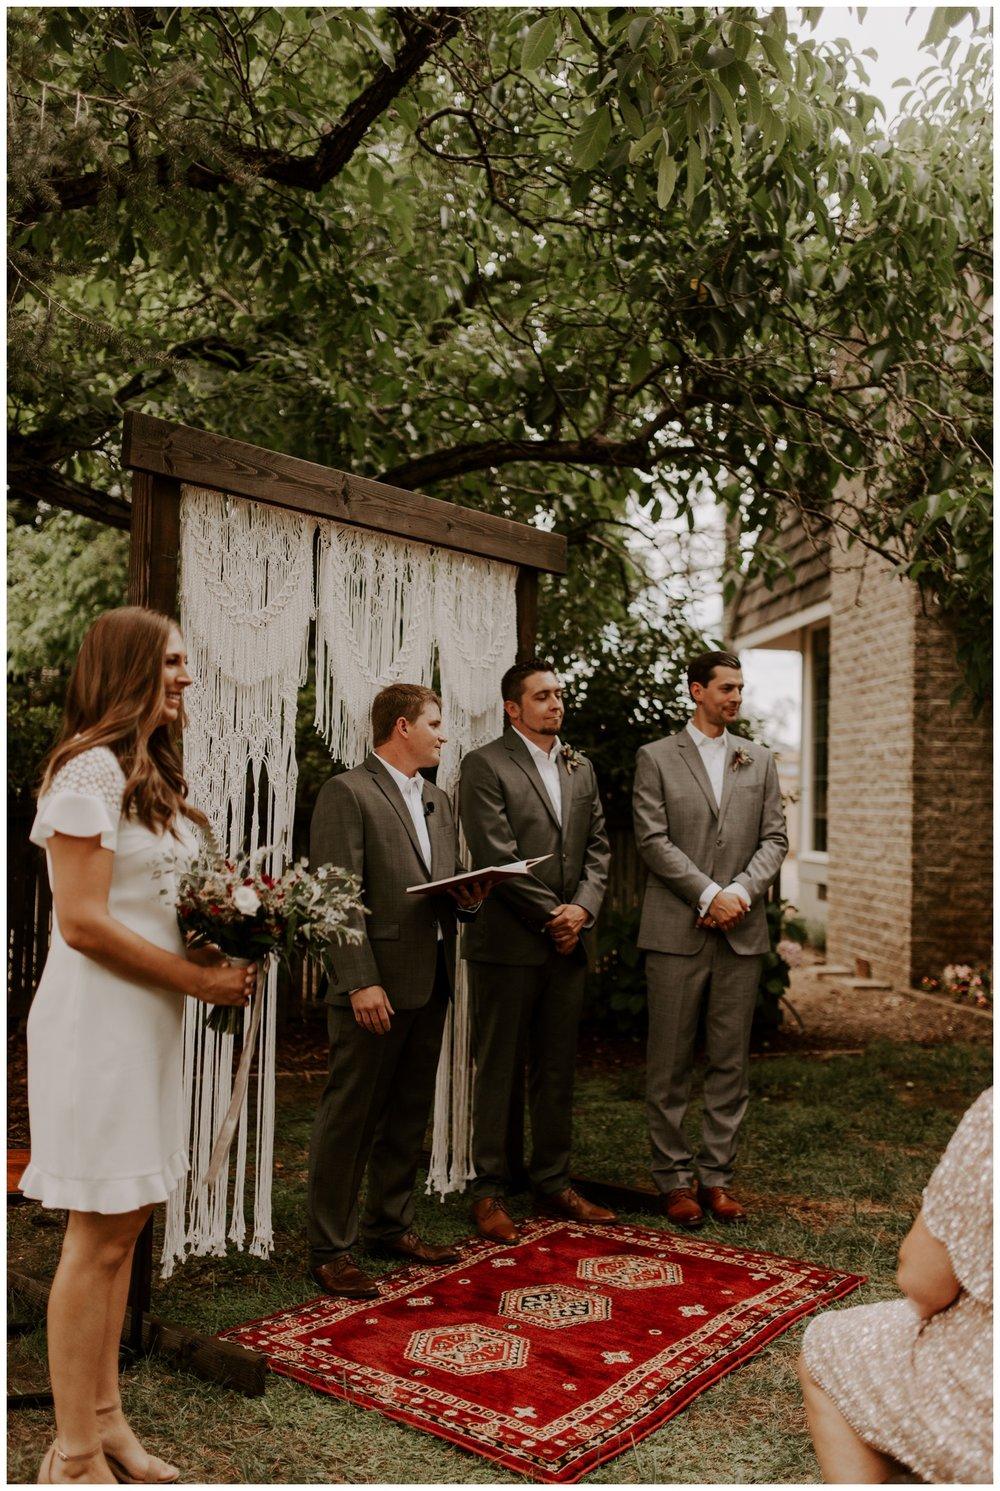 Napa Valley Backyard Wedding and Reception at Elizabeth Spencer Winery | Jessica Heron Images 046.jpg